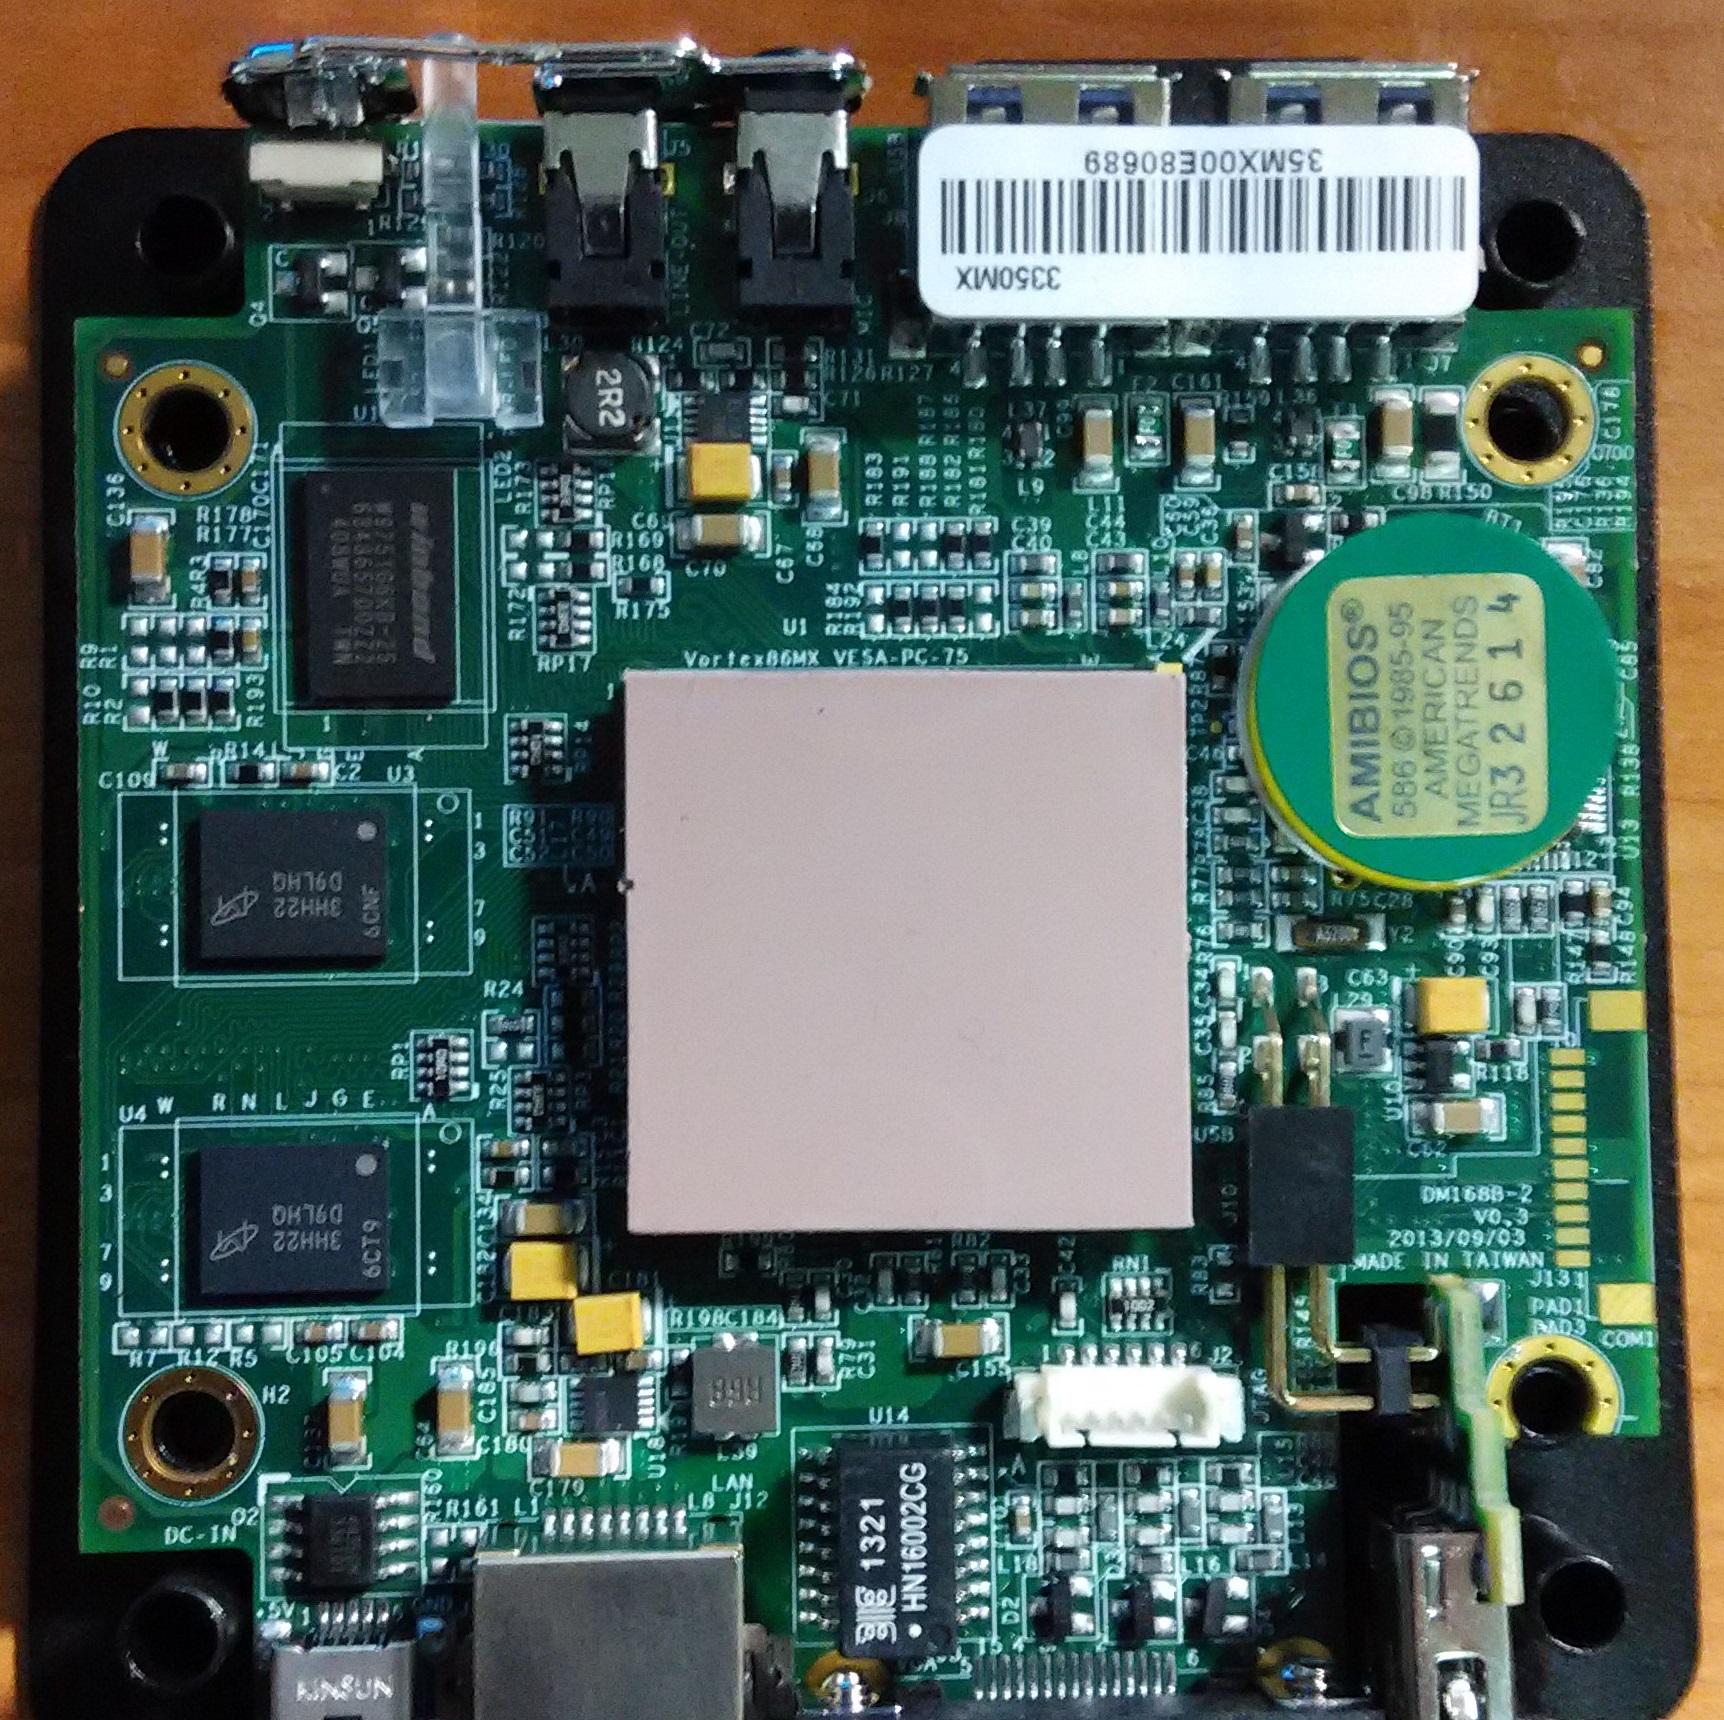 Ebox 3350mx X86 Compact Pc Toughdev